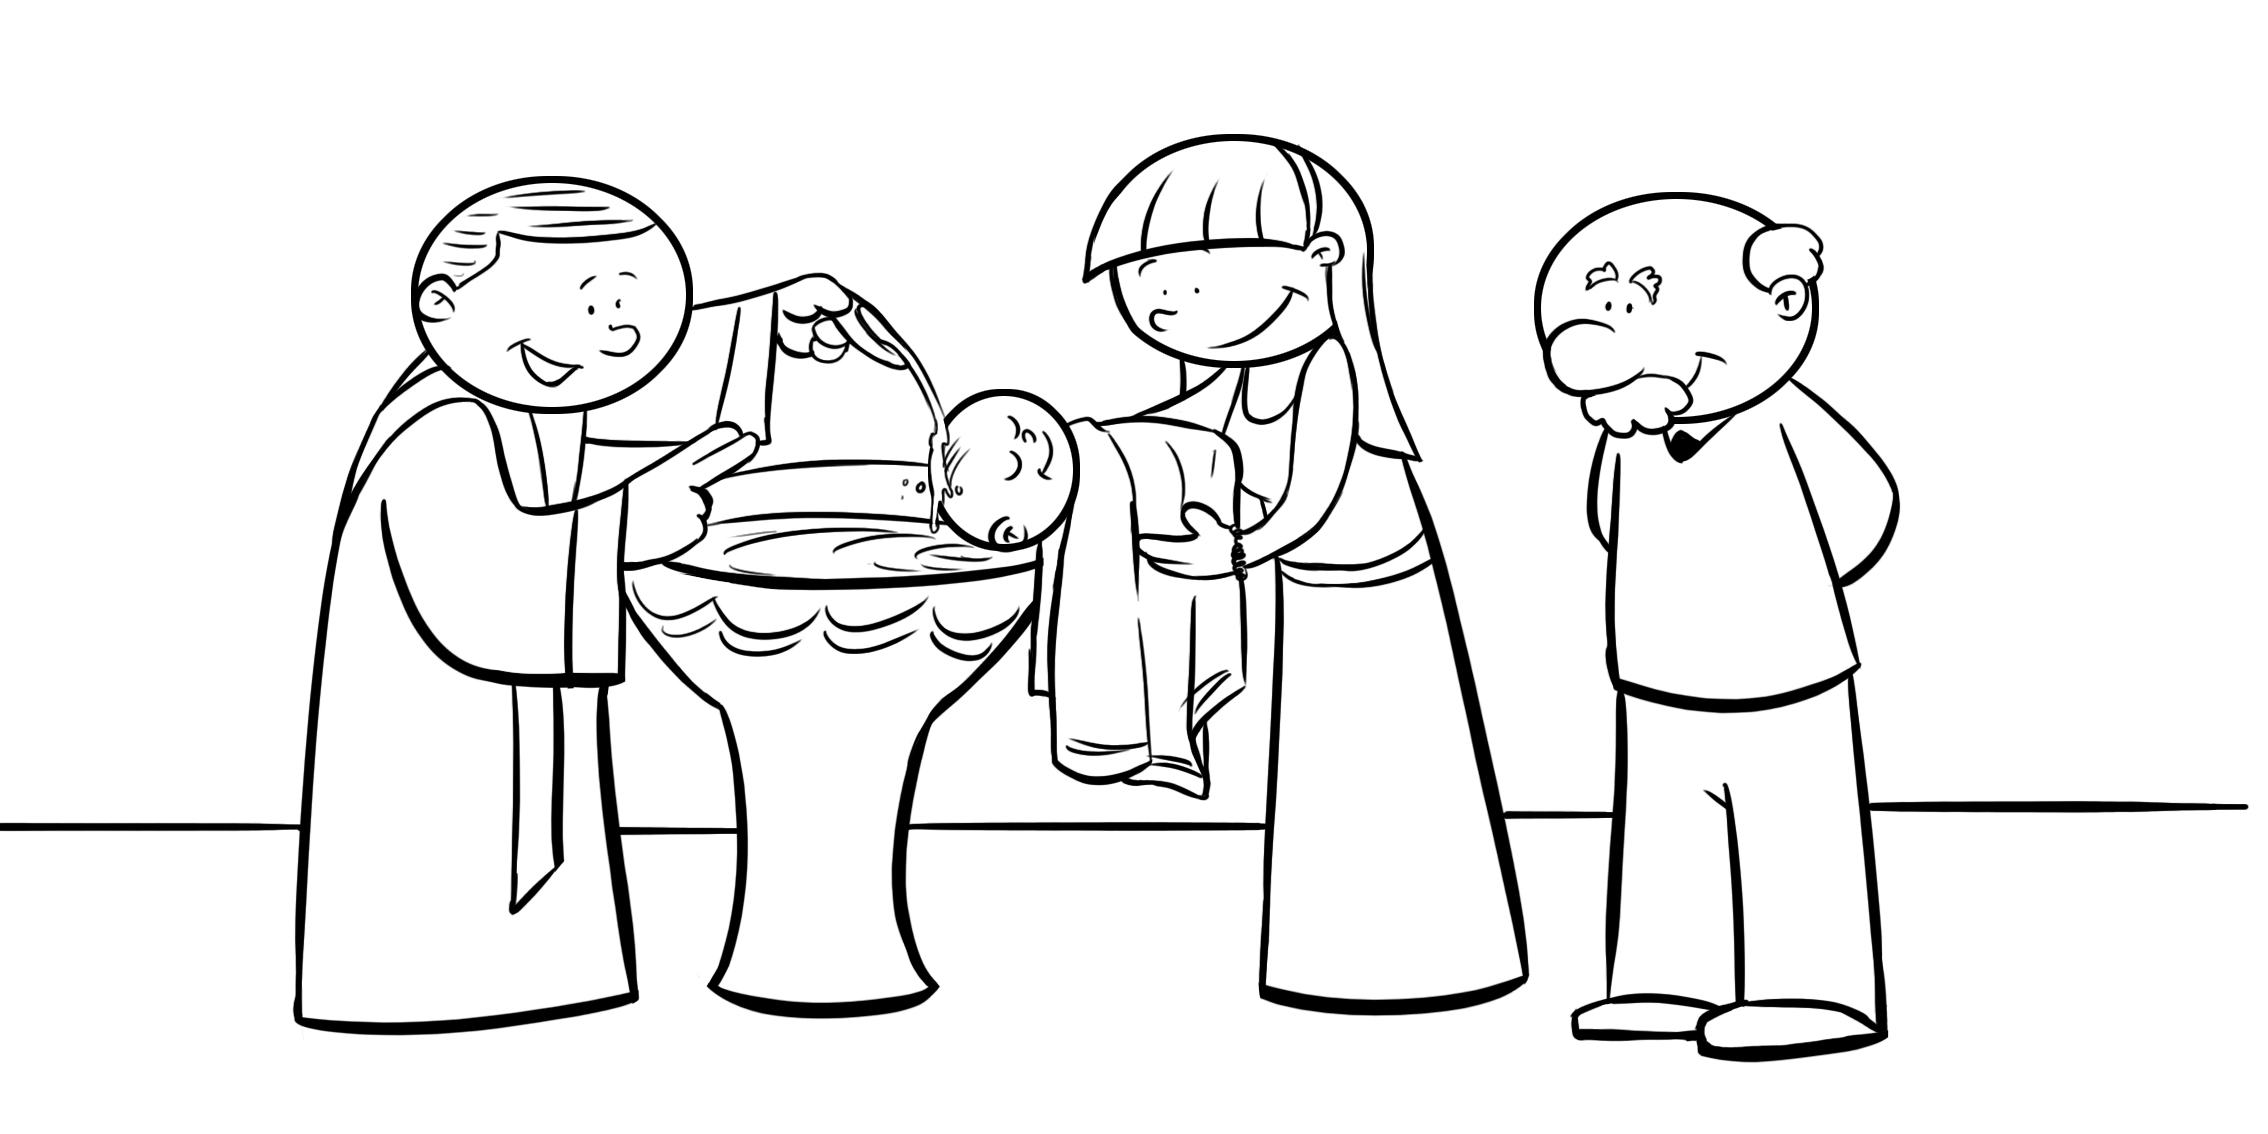 Desenho De Familia Batizando Bebe Para Colorir